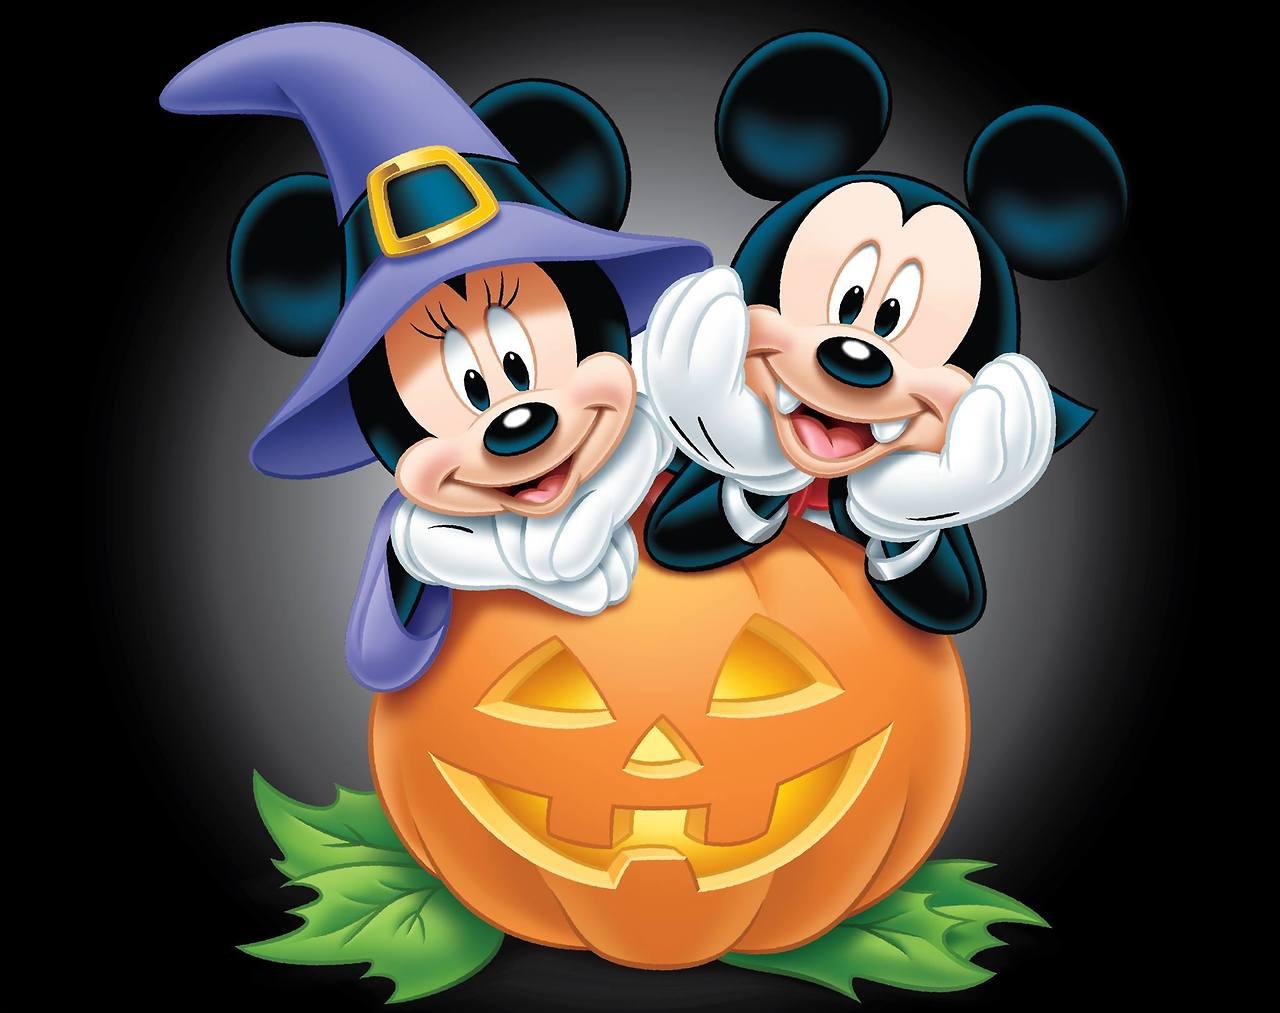 Image mickey and minnie disney wiki - Disney halloween images ...